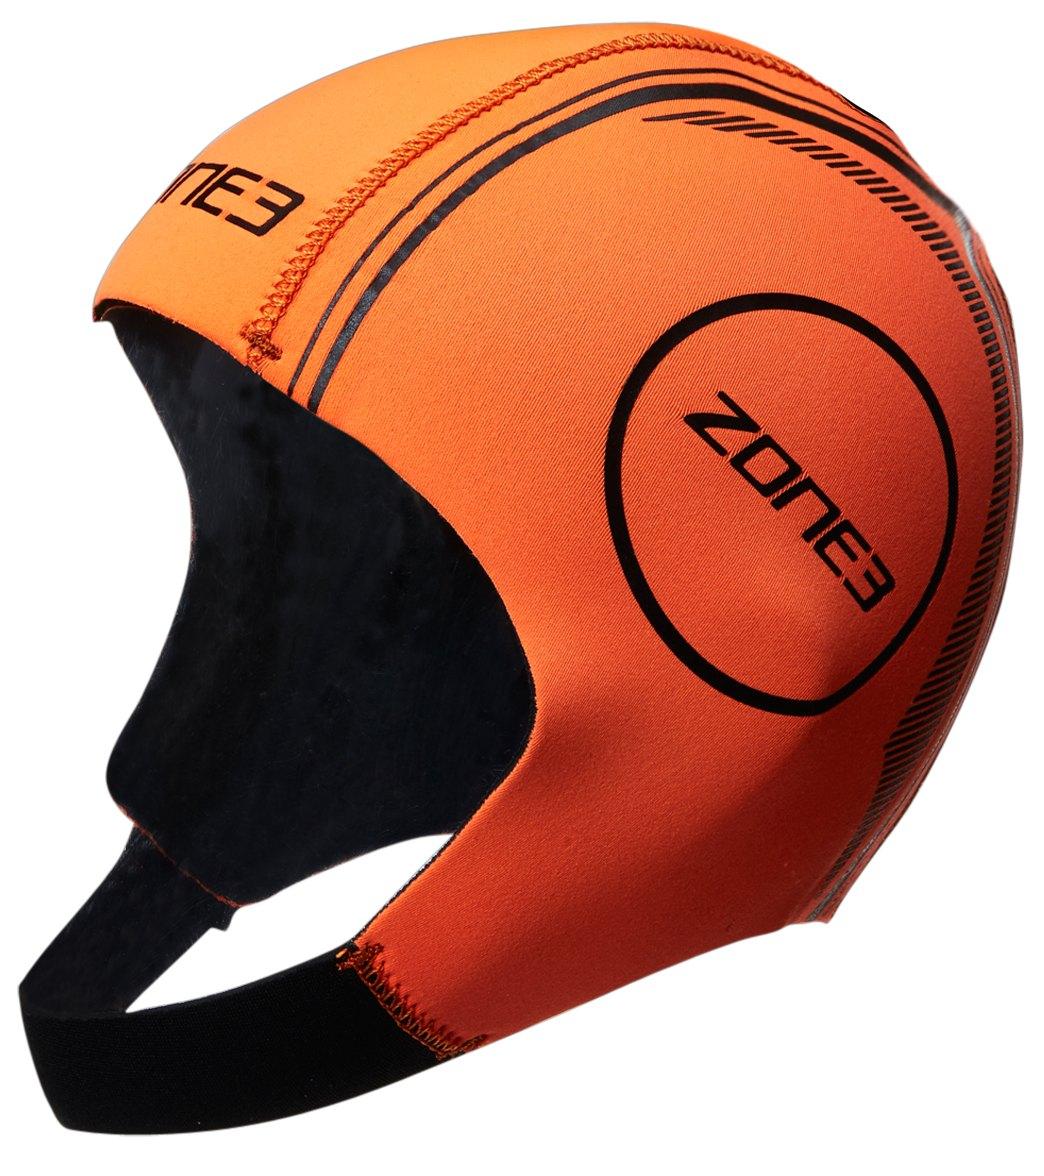 81c4dbbbb9c Zone 3 Neoprene Swim Cap at SwimOutlet.com